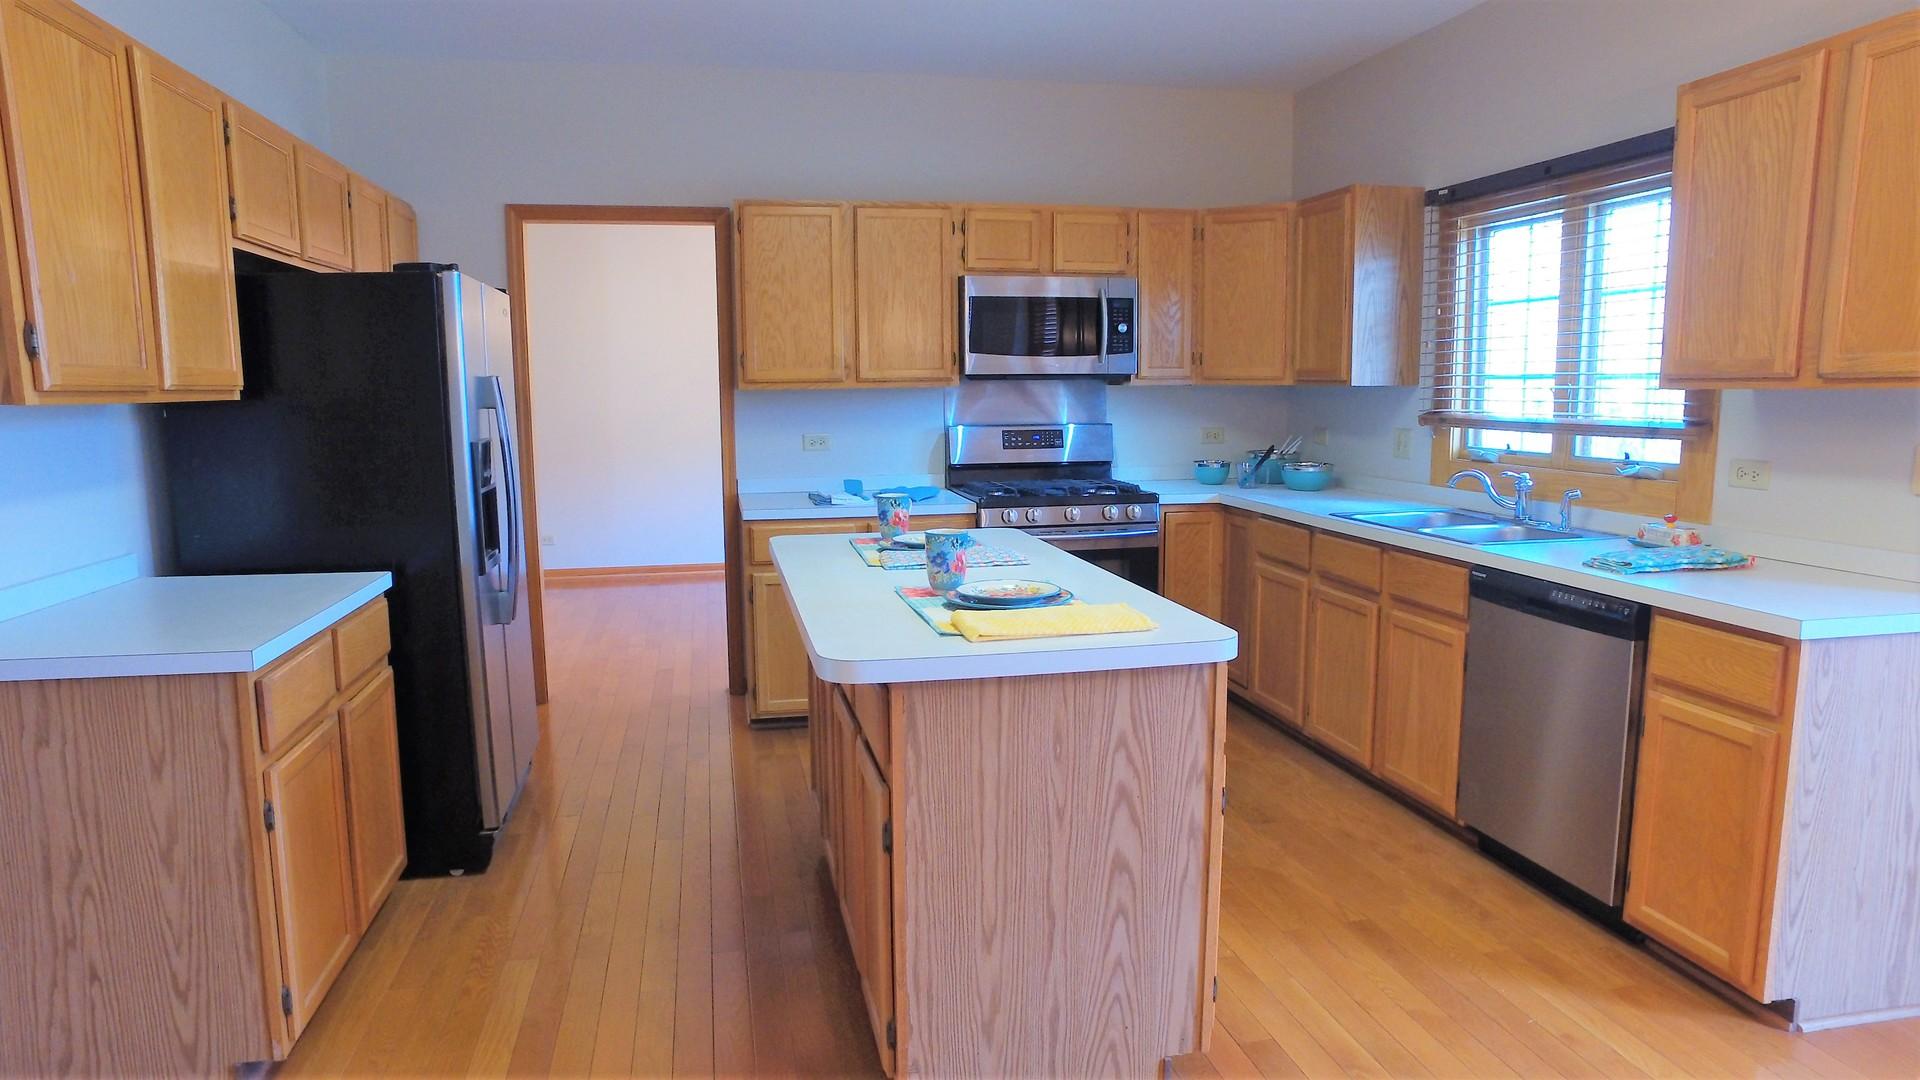 422 Yorkshire, Grayslake, Illinois, 60030